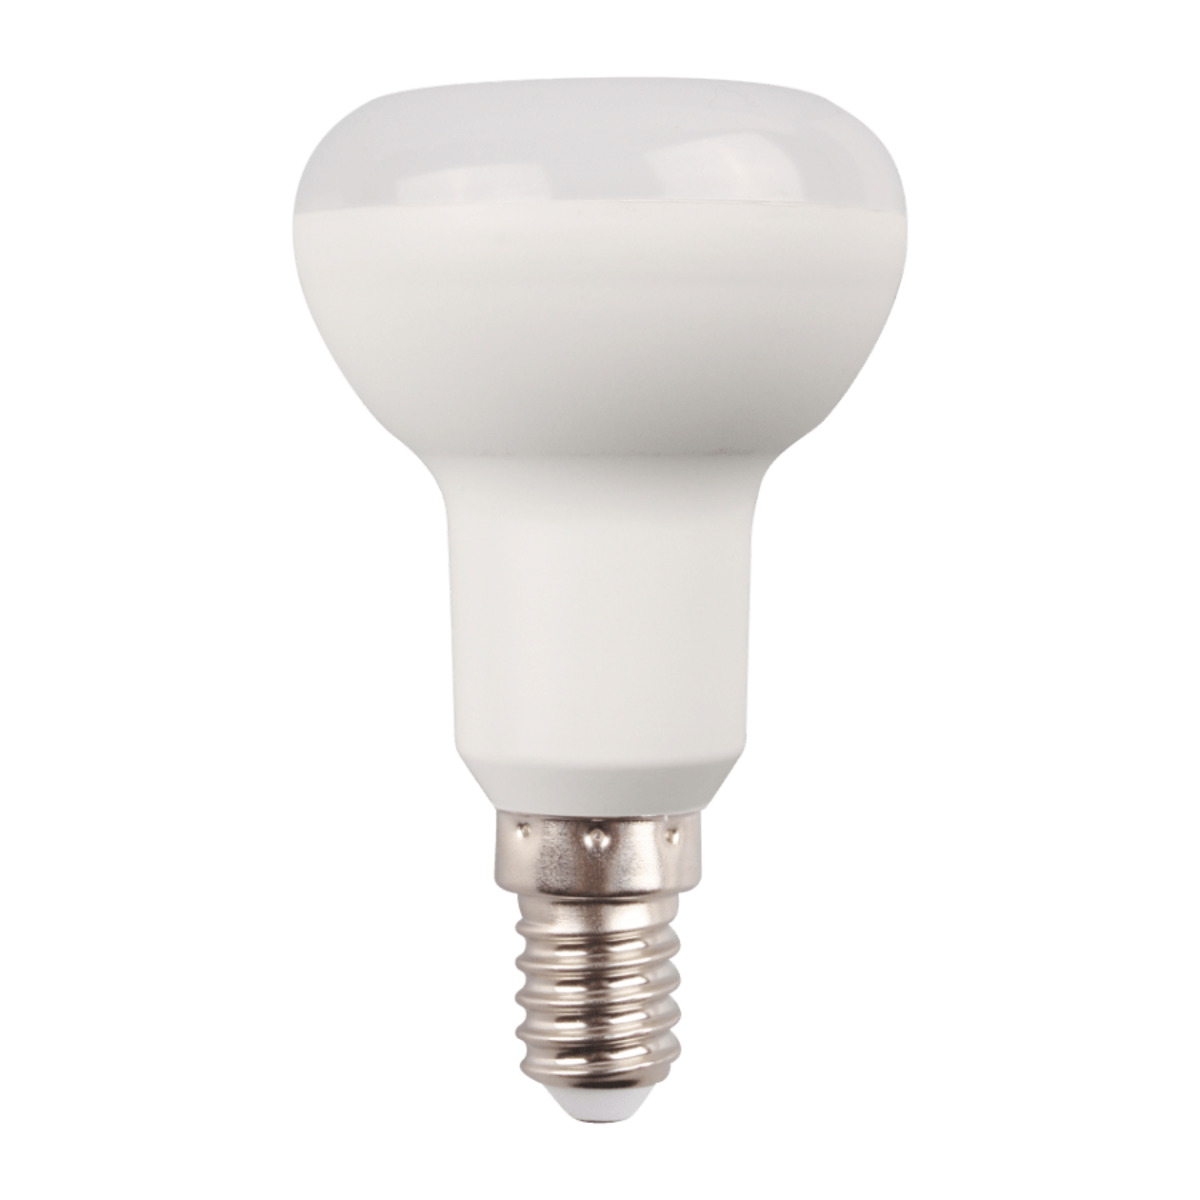 Bild 2 von LIGHTZONE     LED-Reflektor